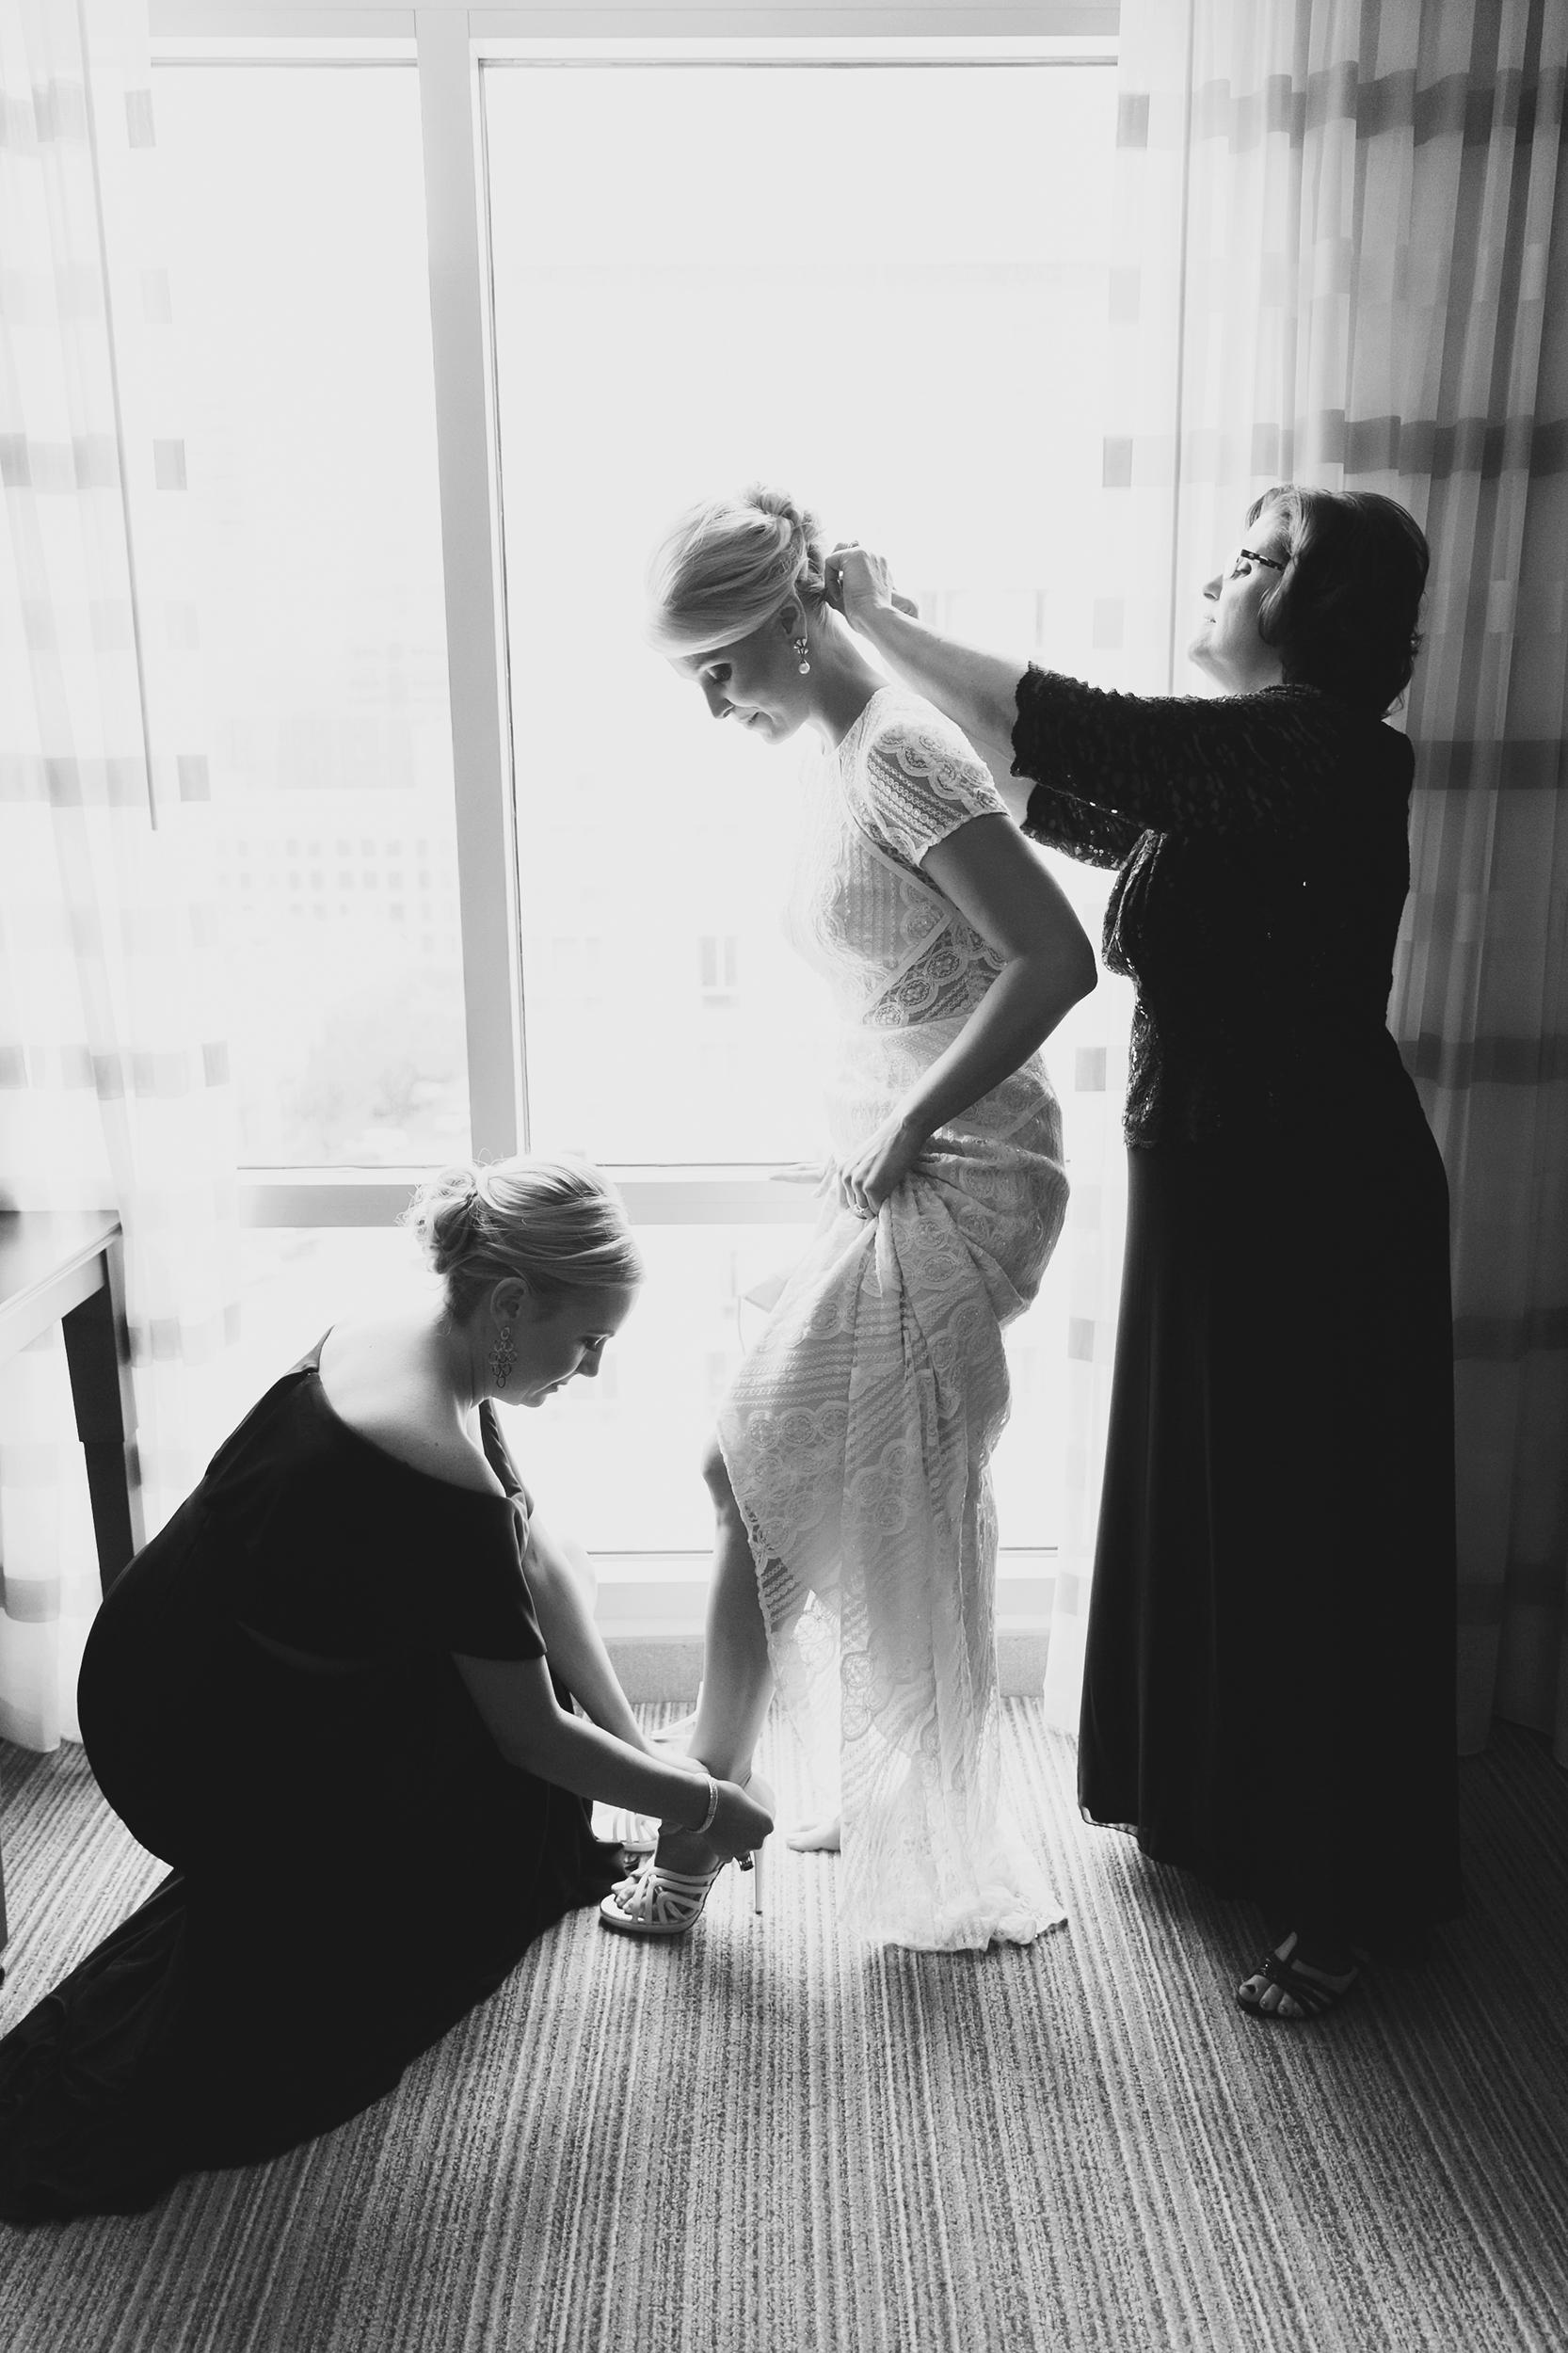 Austin_Wedding_Photographer_Kimberly_Brooke_Photographic_186.jpg